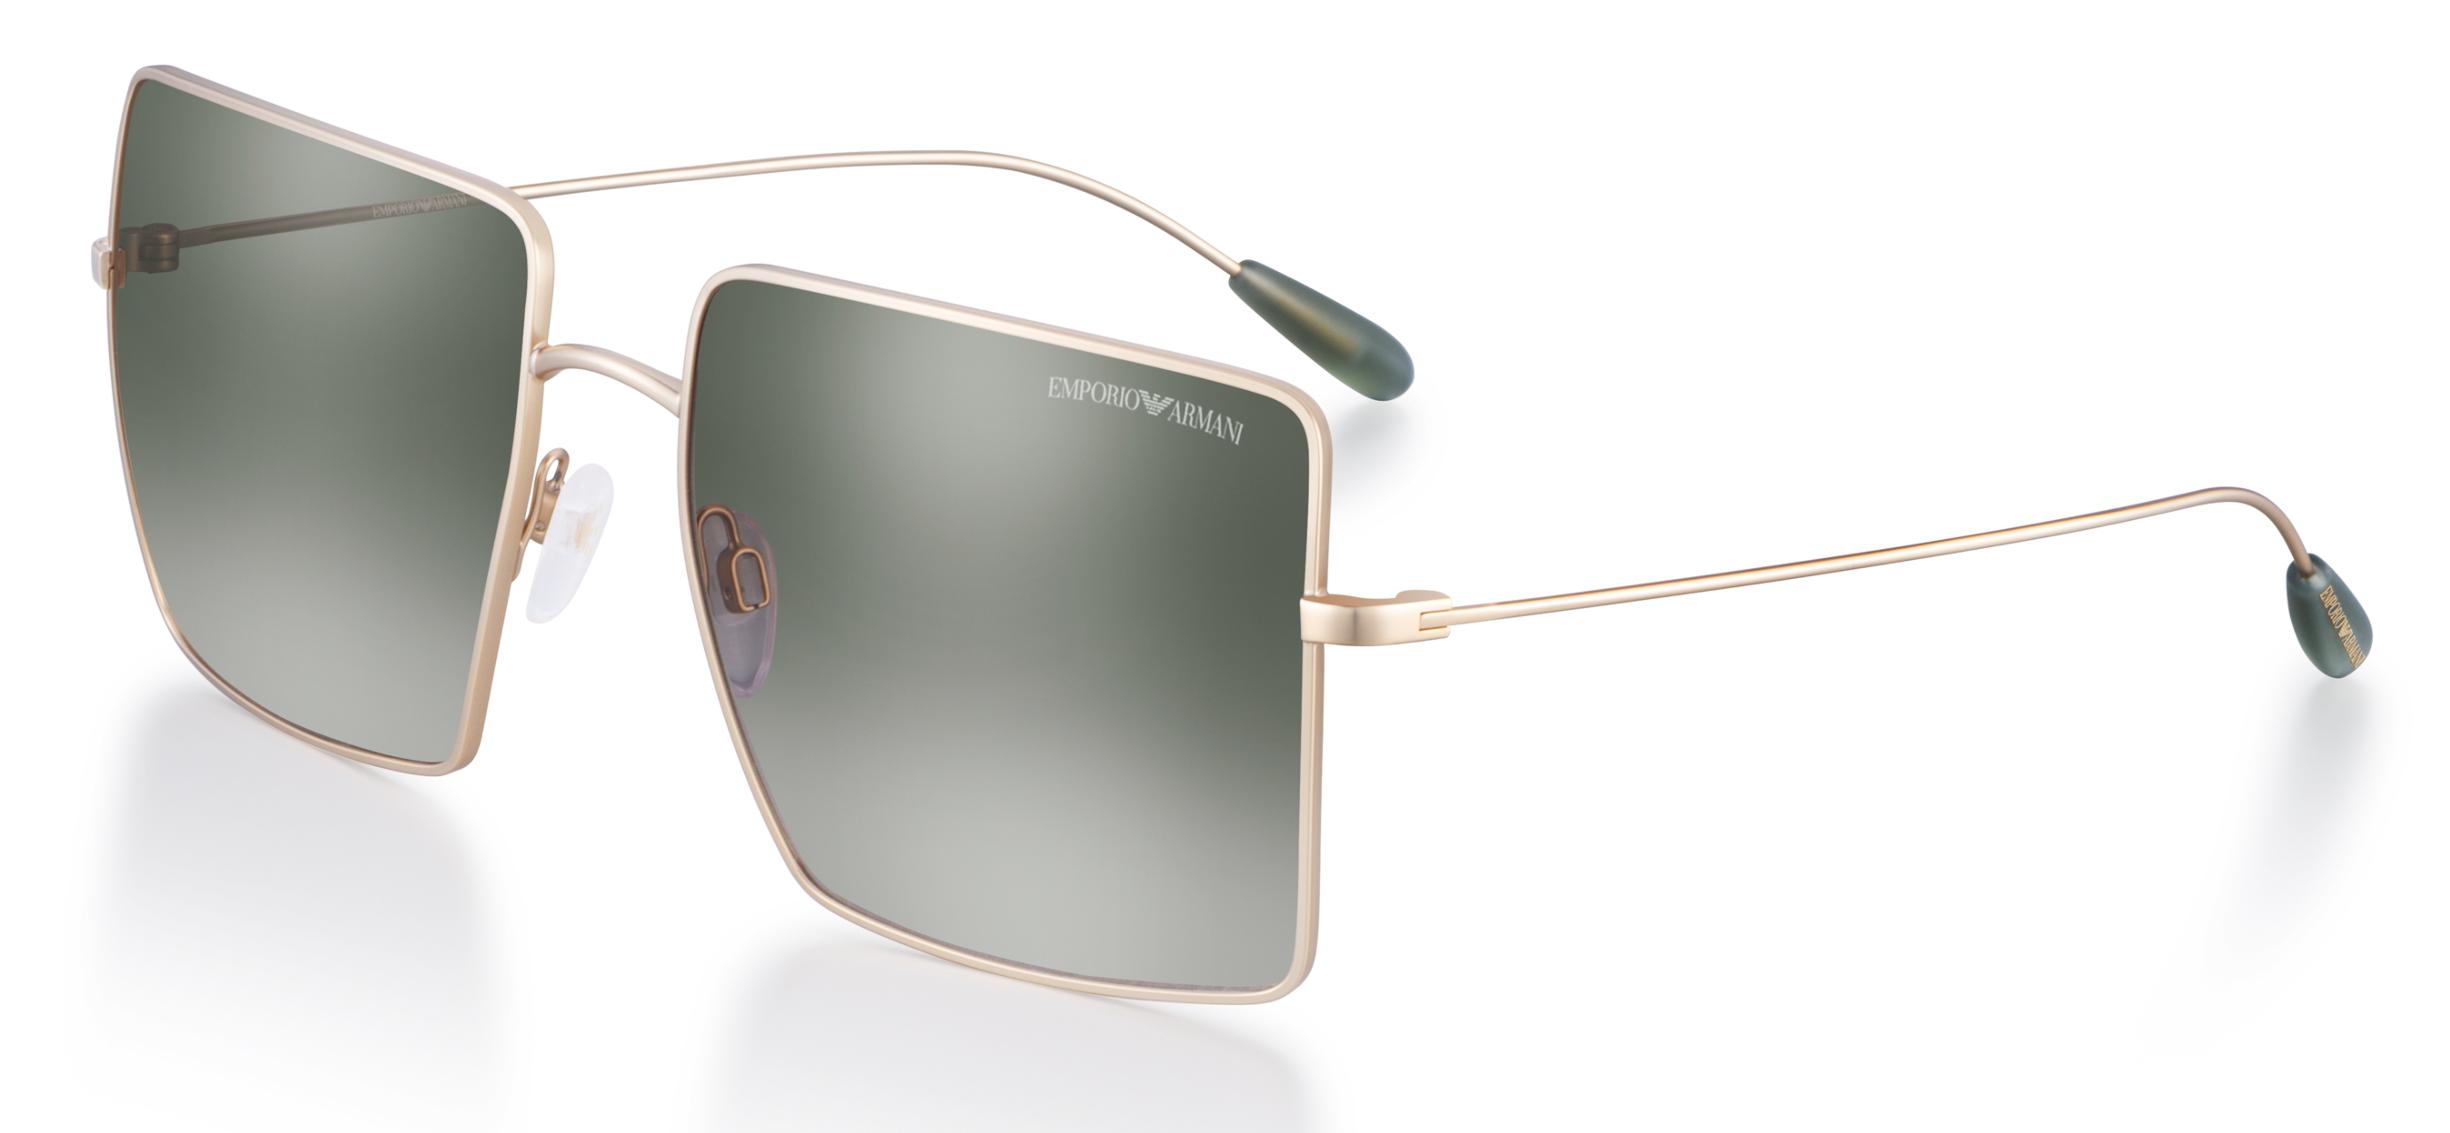 occhiali da sole estate 2020